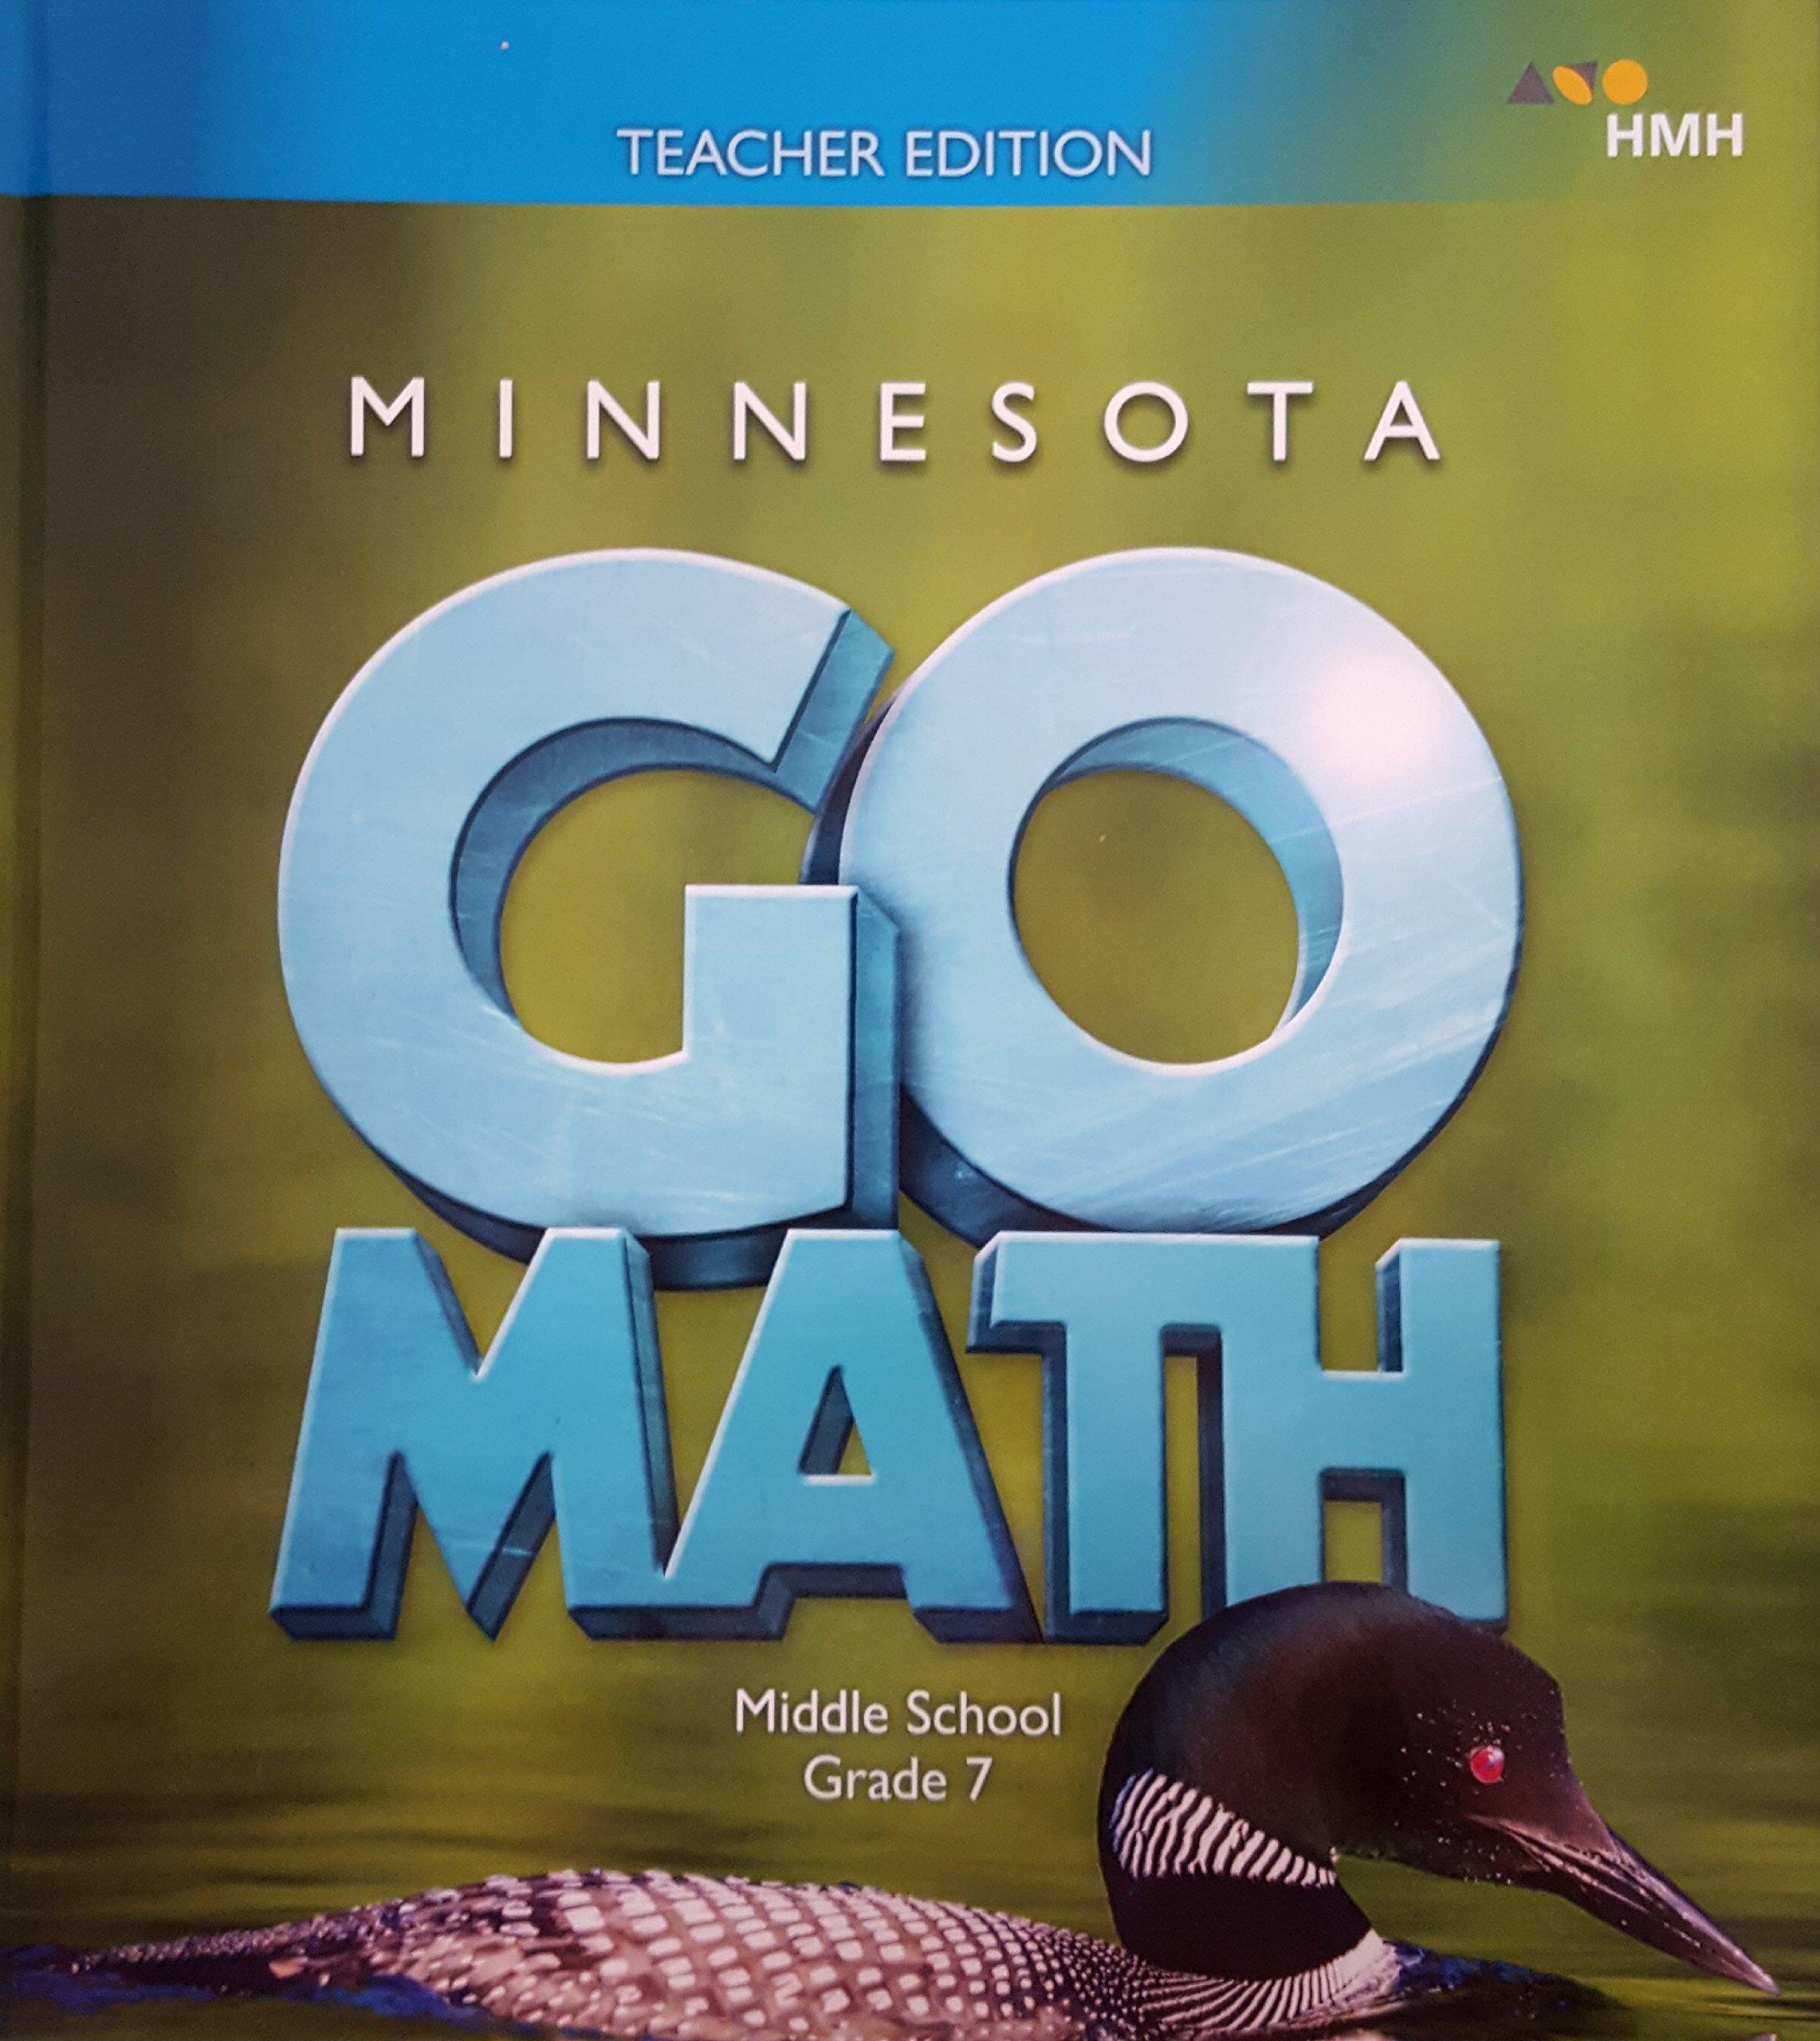 Go Math, Middle School, Grade 7, Teacher Edition, Minnesota